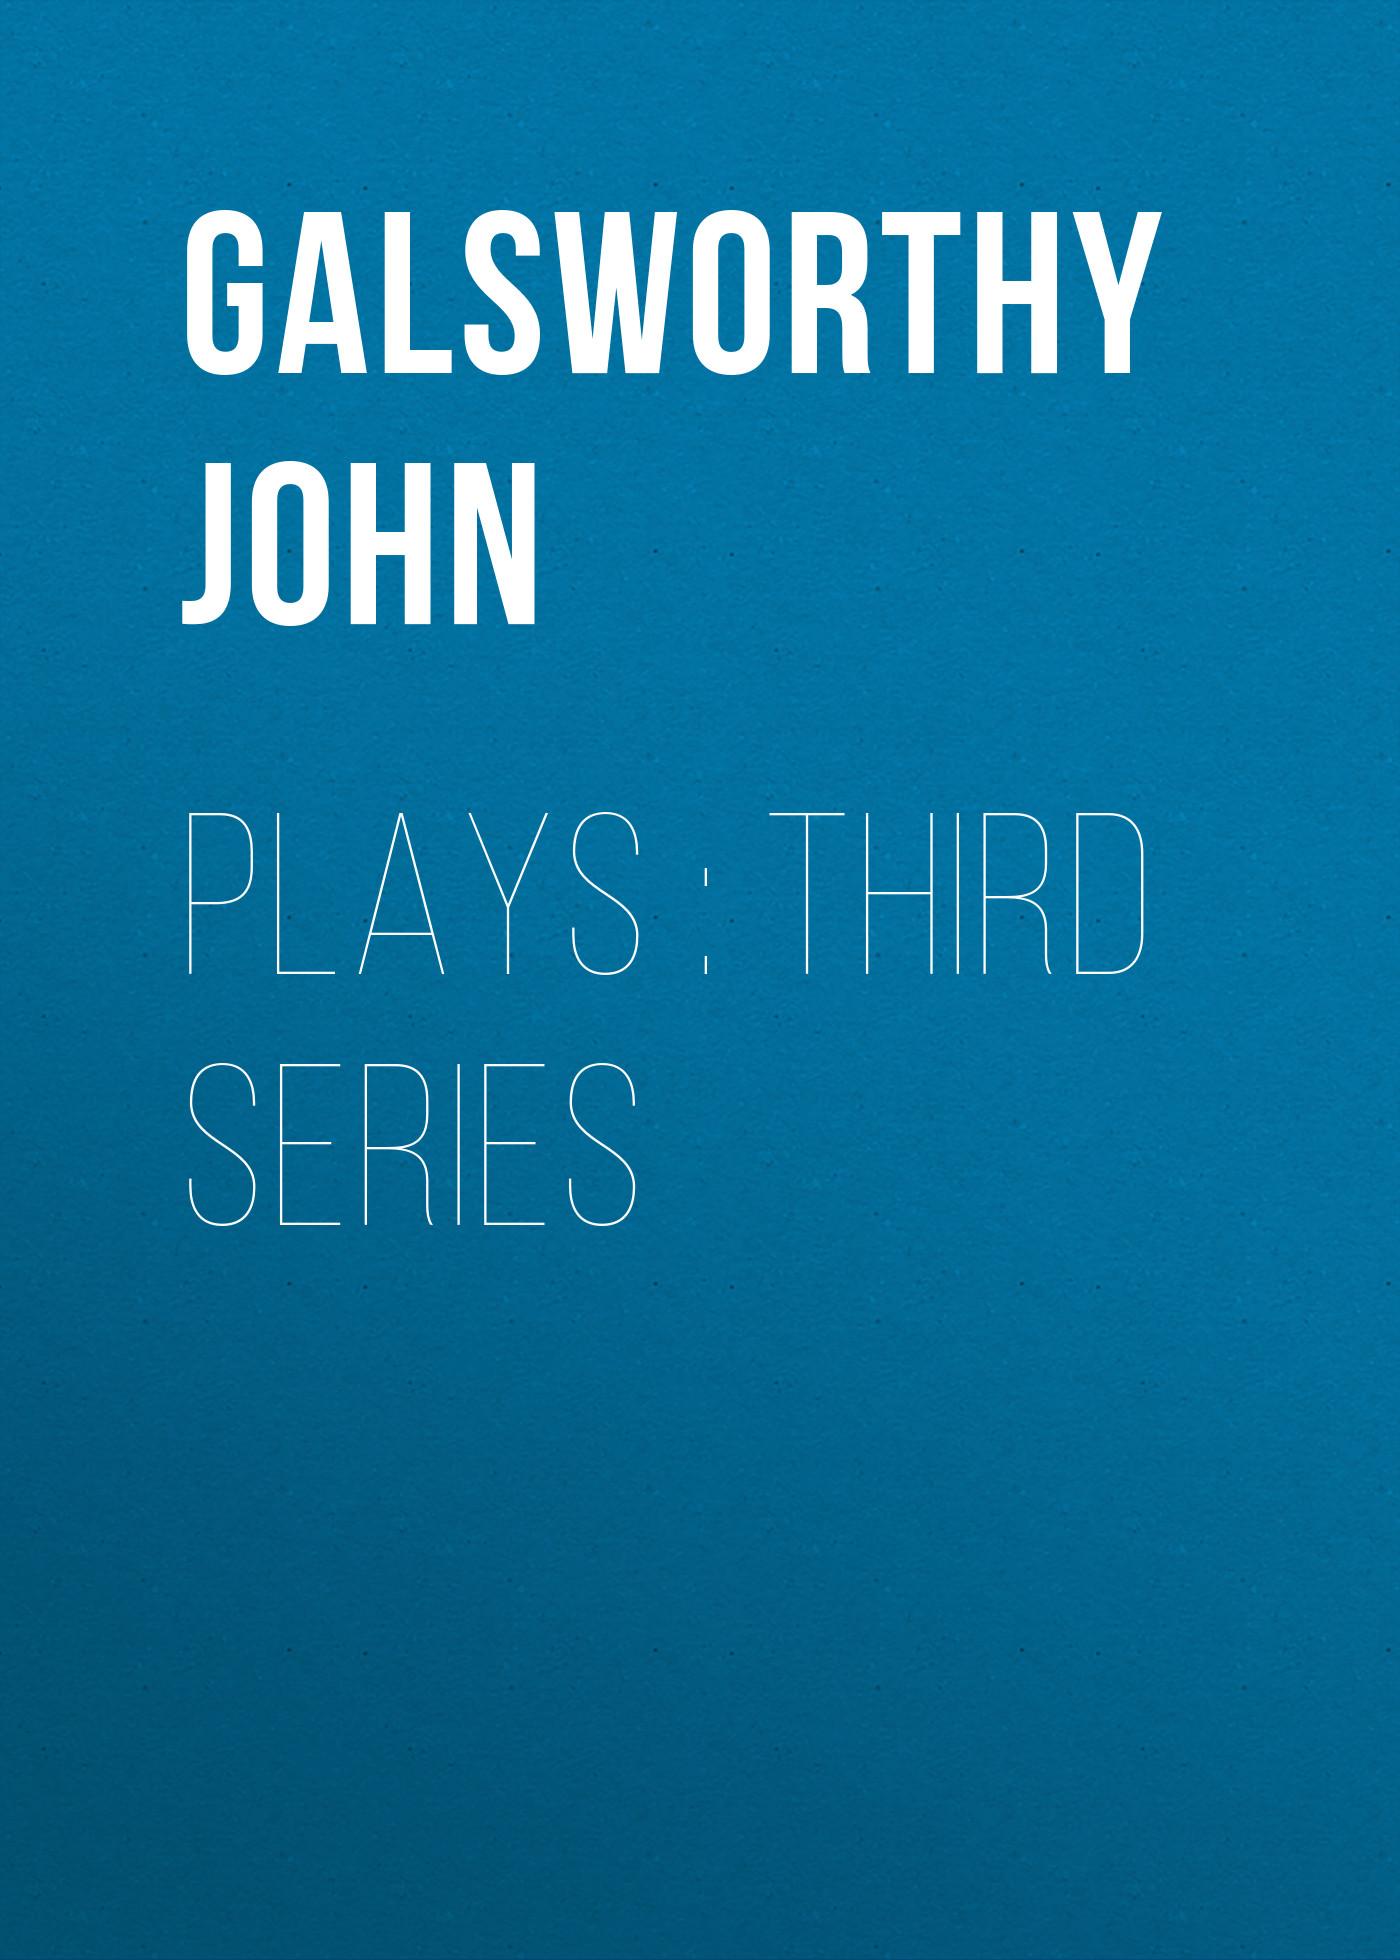 plays third series